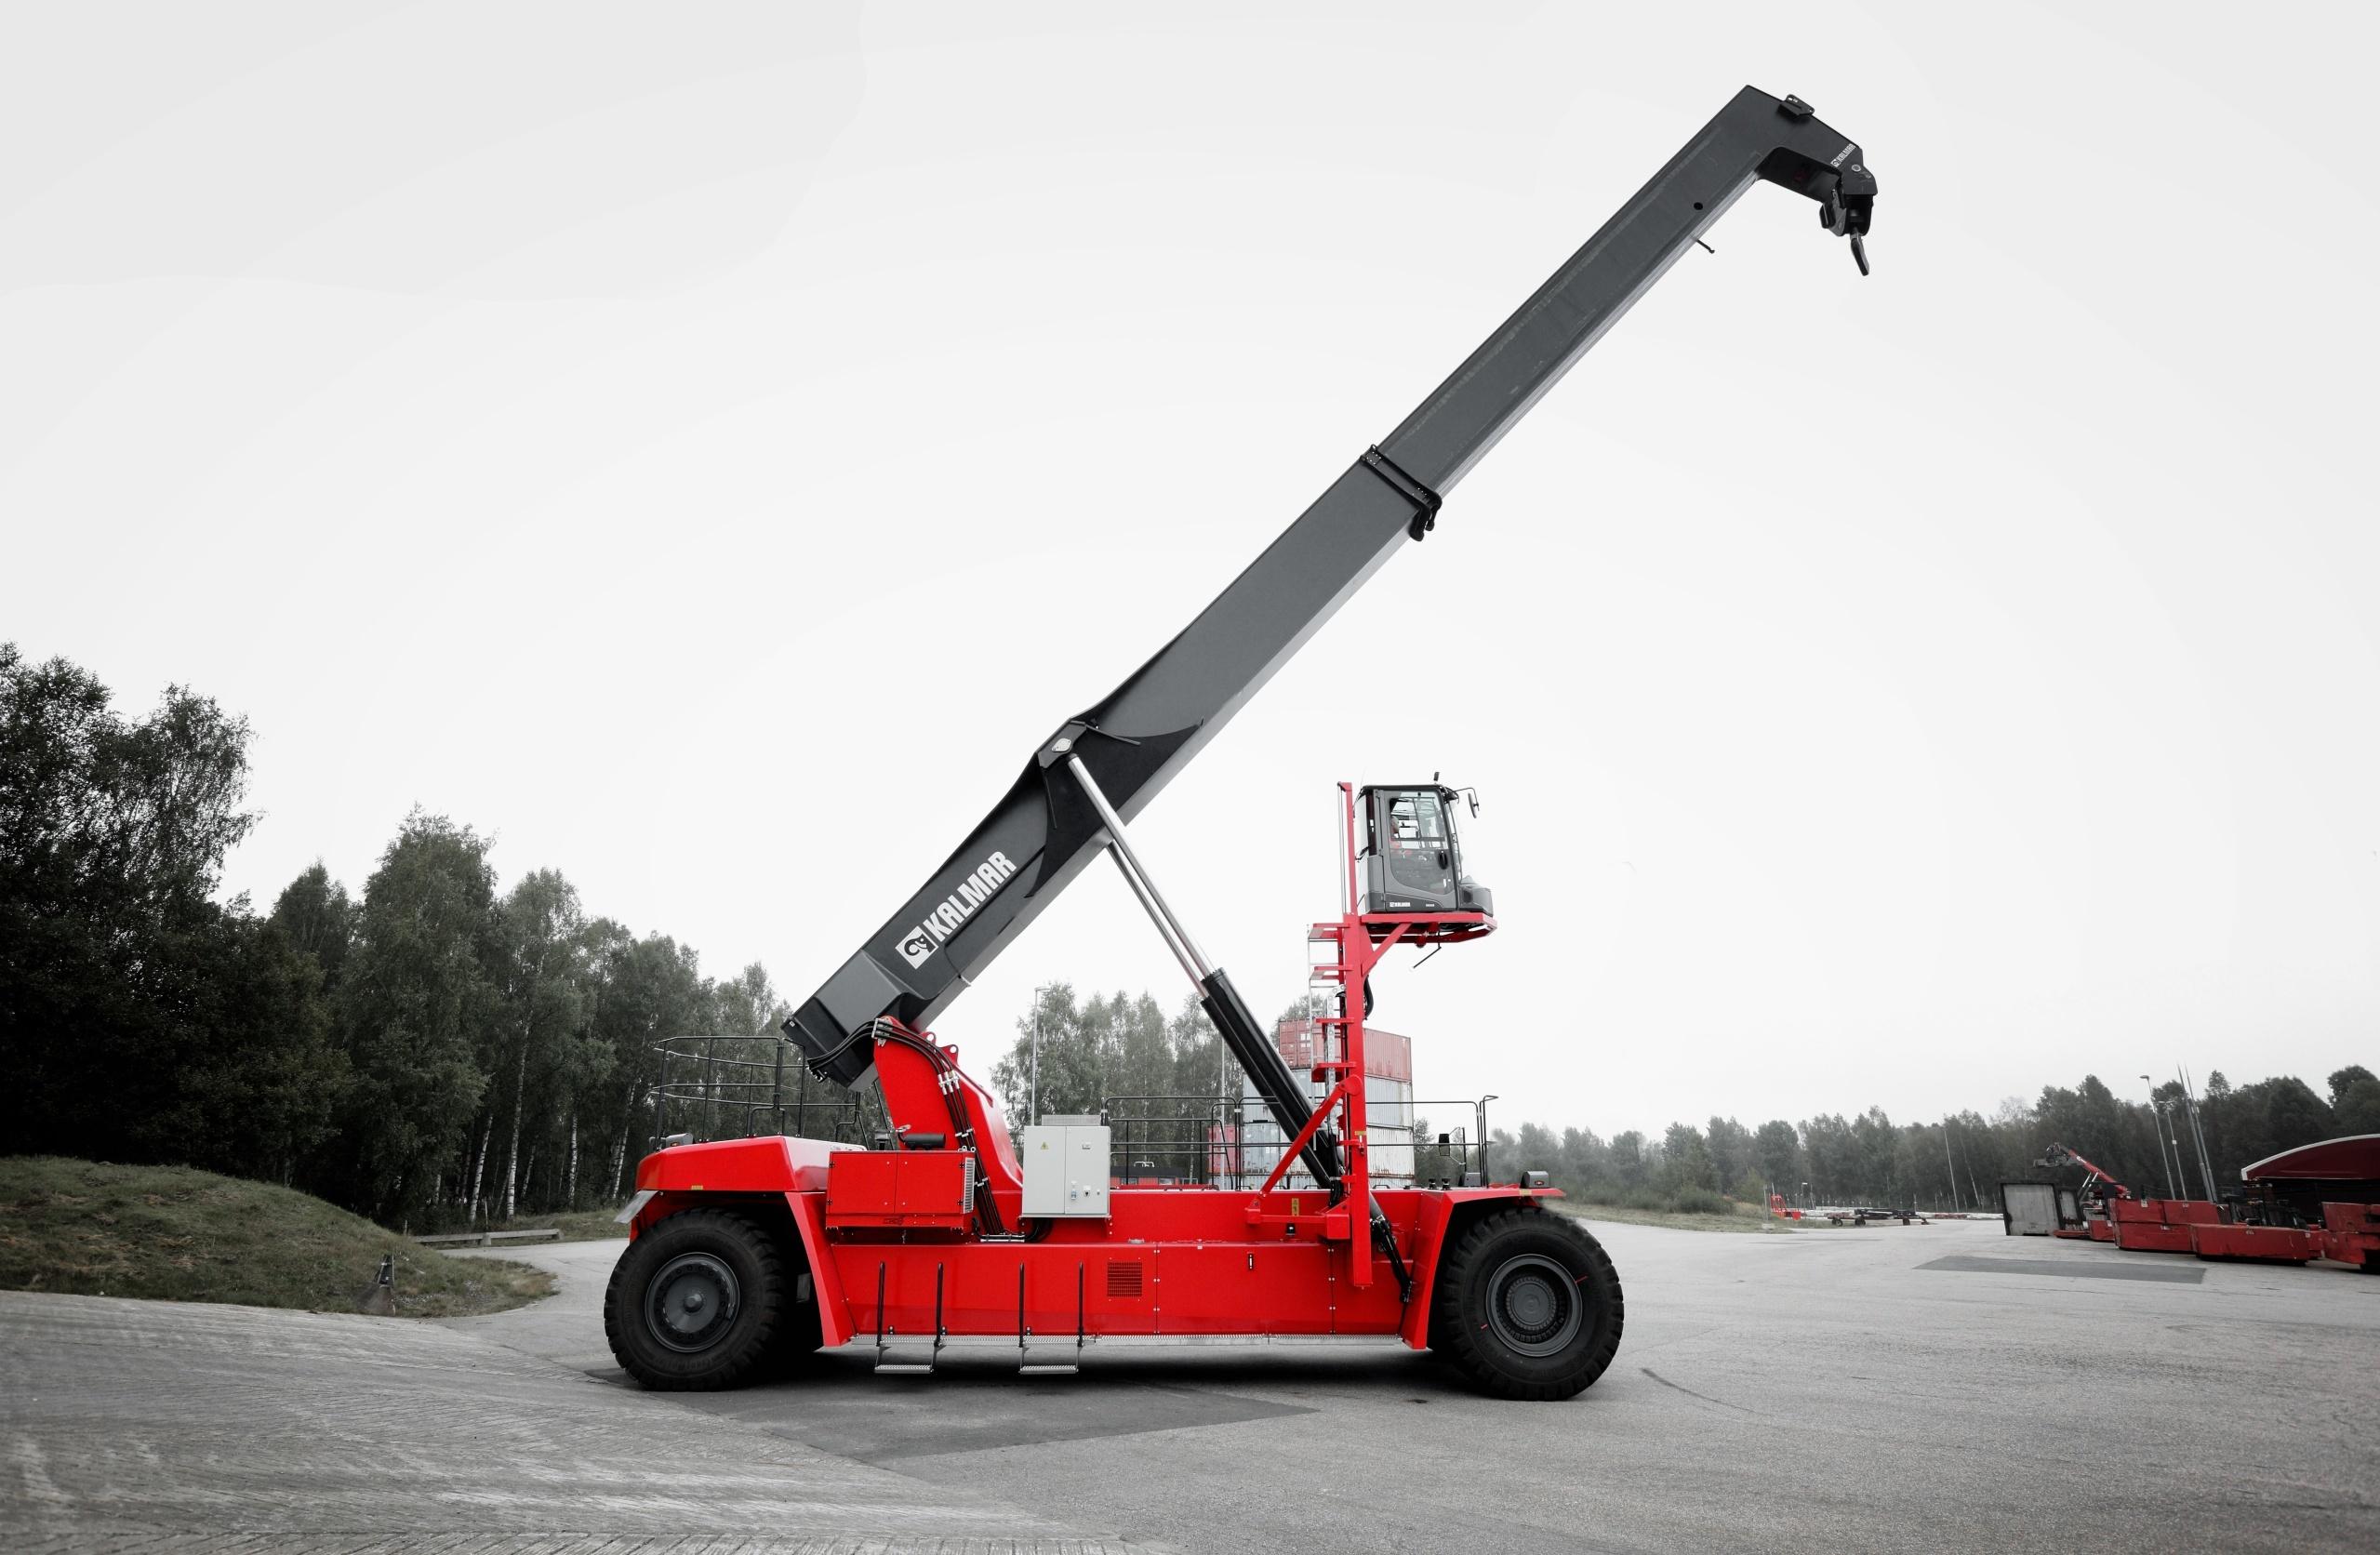 kalmar receives double order for the new super gloria reachstacker rh kalmarglobal com kalmar reach stacker specifications Kalmar Reach Stacker Dealer